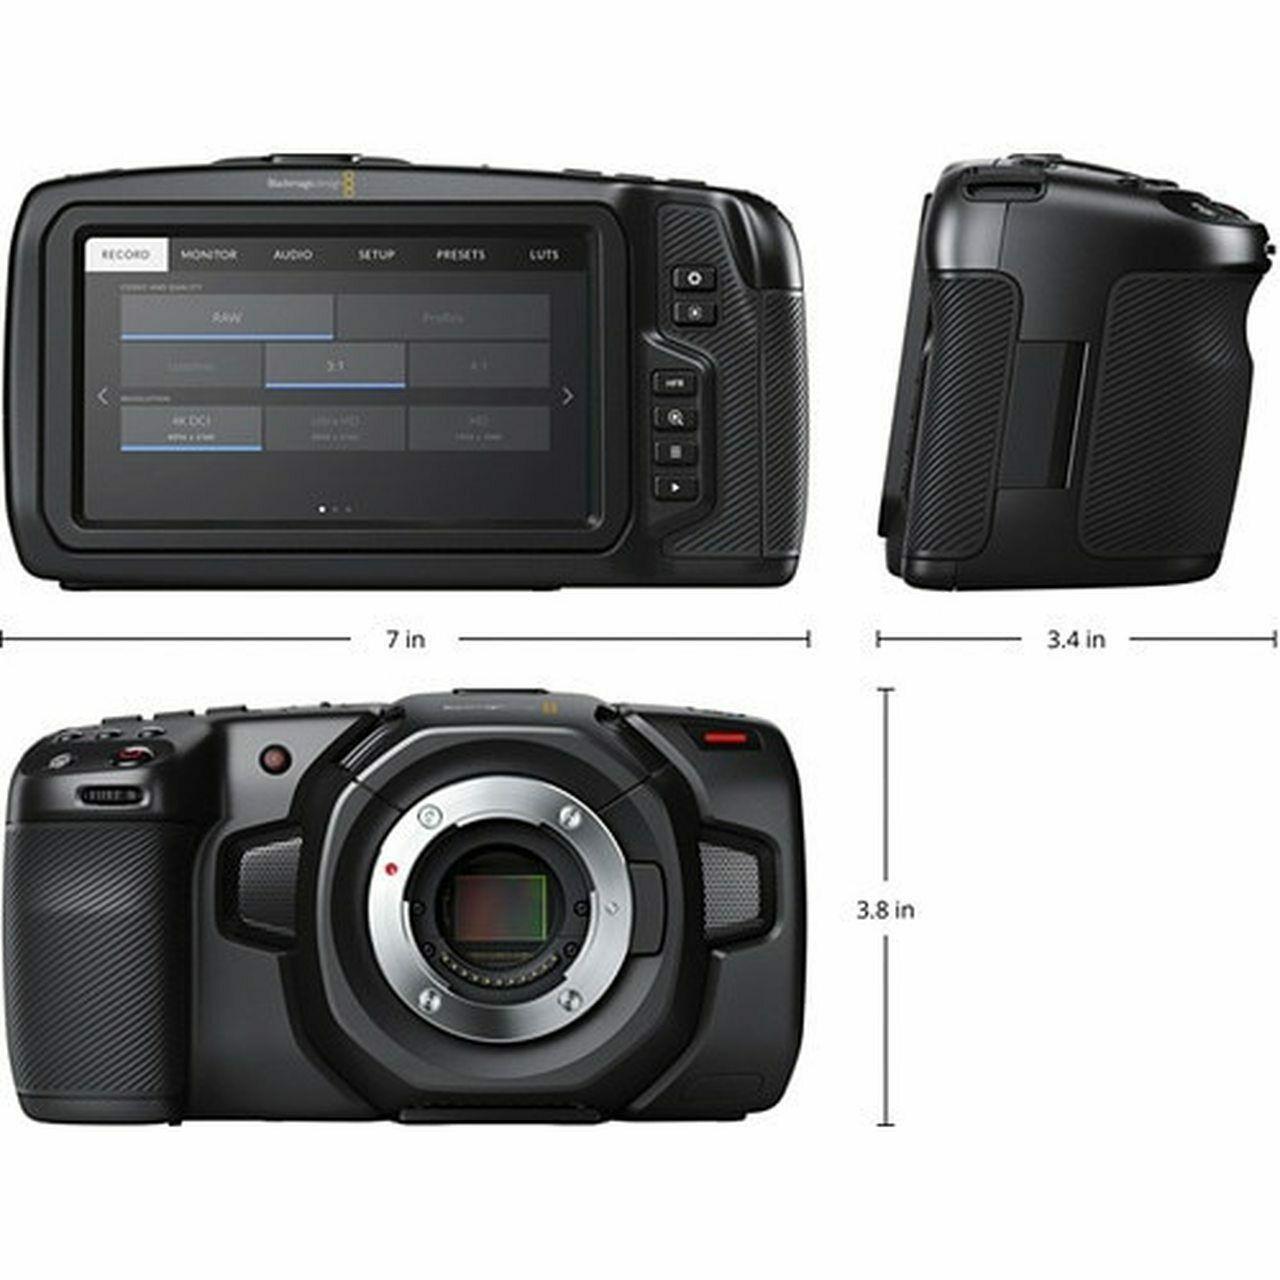 Blackmagic Design Pocket Cinema Camera 4k With Case